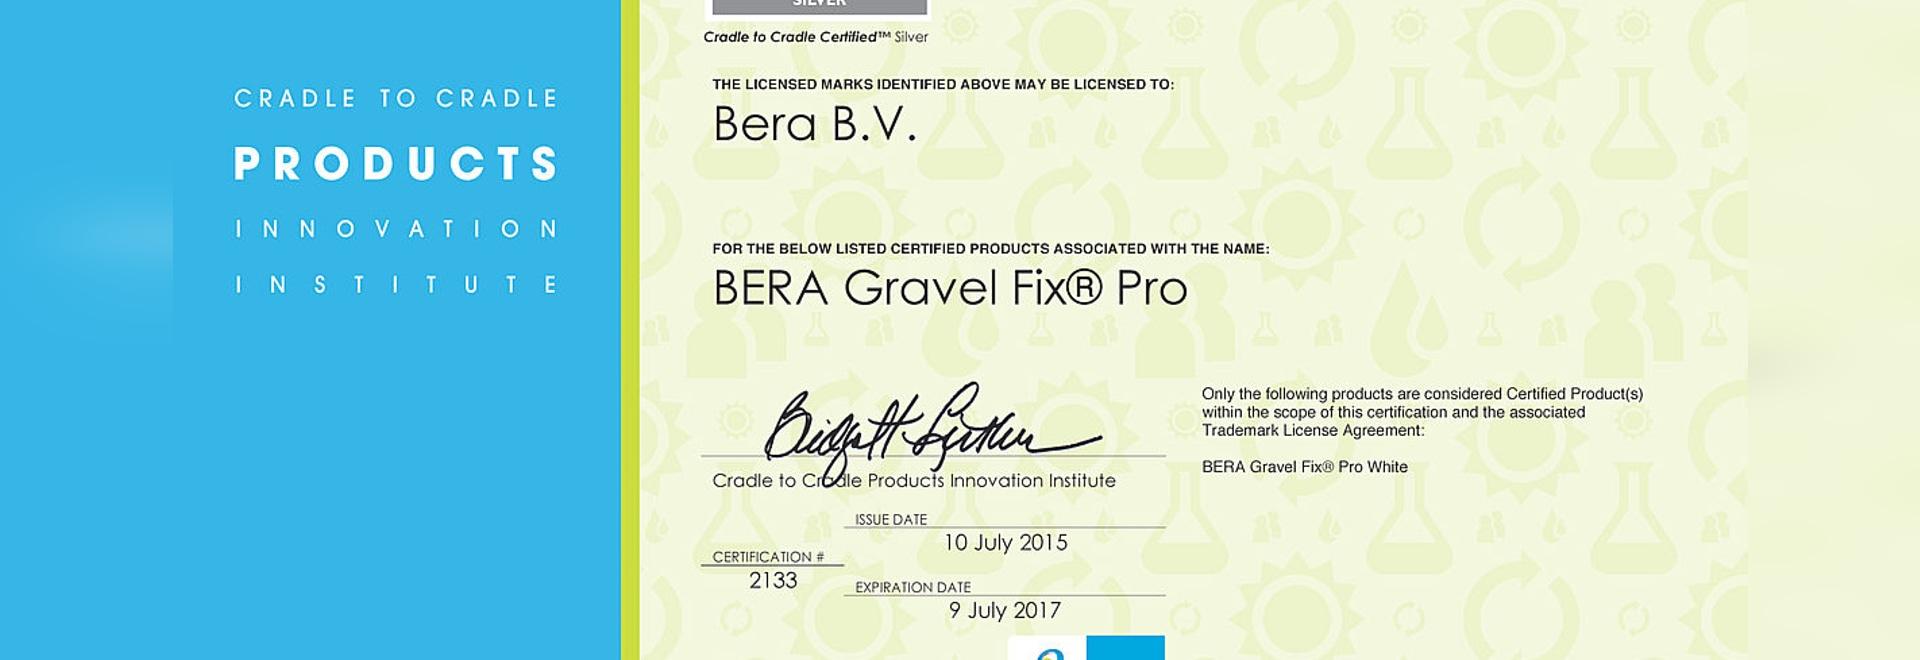 BERA B.V. awarded with prestigious CRADLE TO CRADLE certificate!